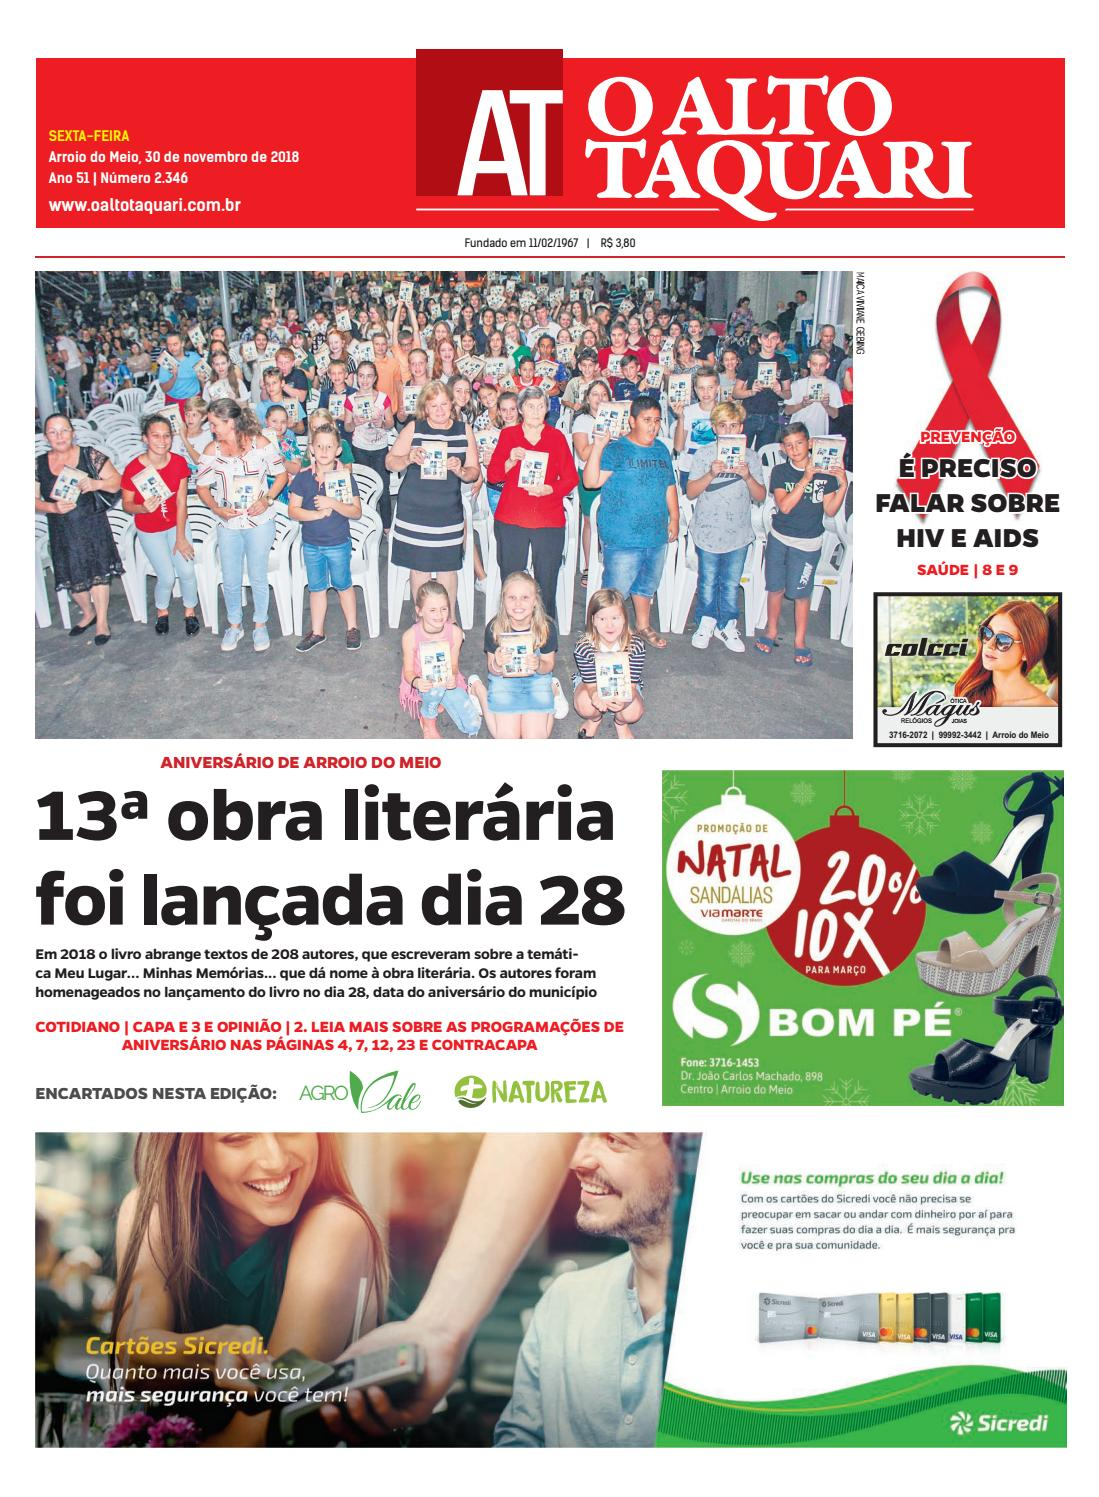 751a82df4 Jornal O Alto Taquari - 30 de novembro de 2018 by Jornal O Alto Taquari -  issuu